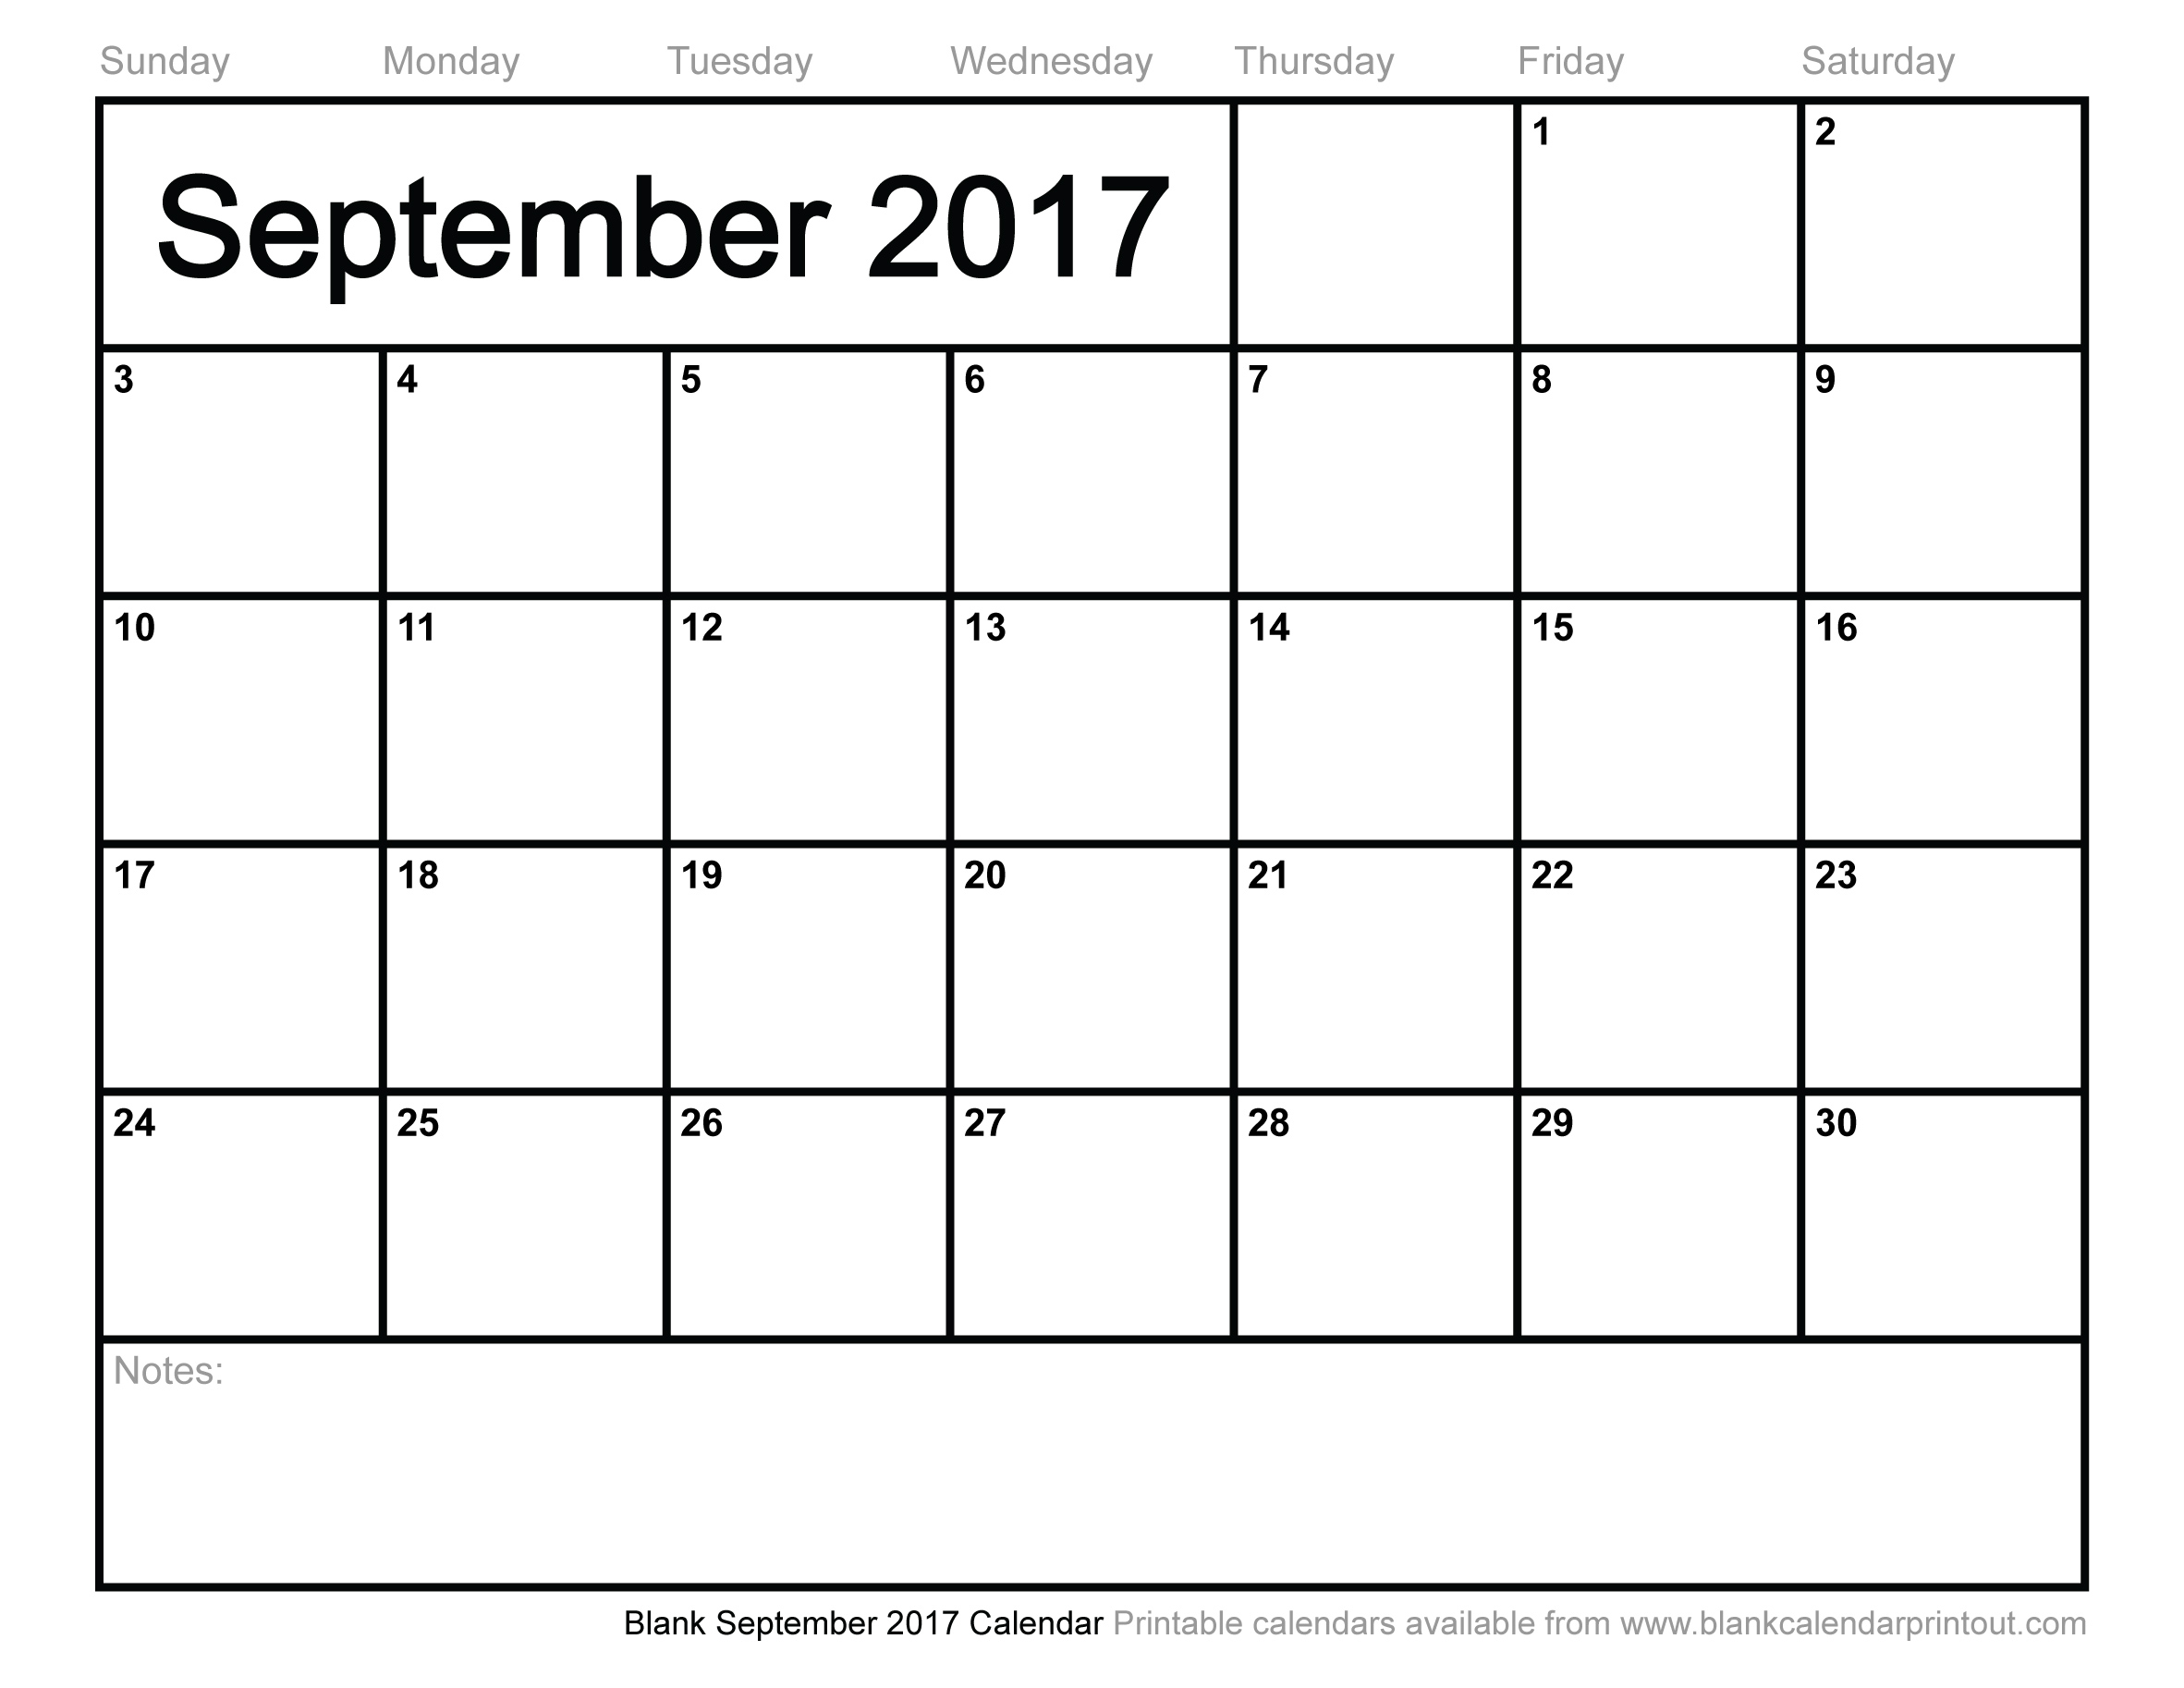 Blank September 2017 Calendar To Print